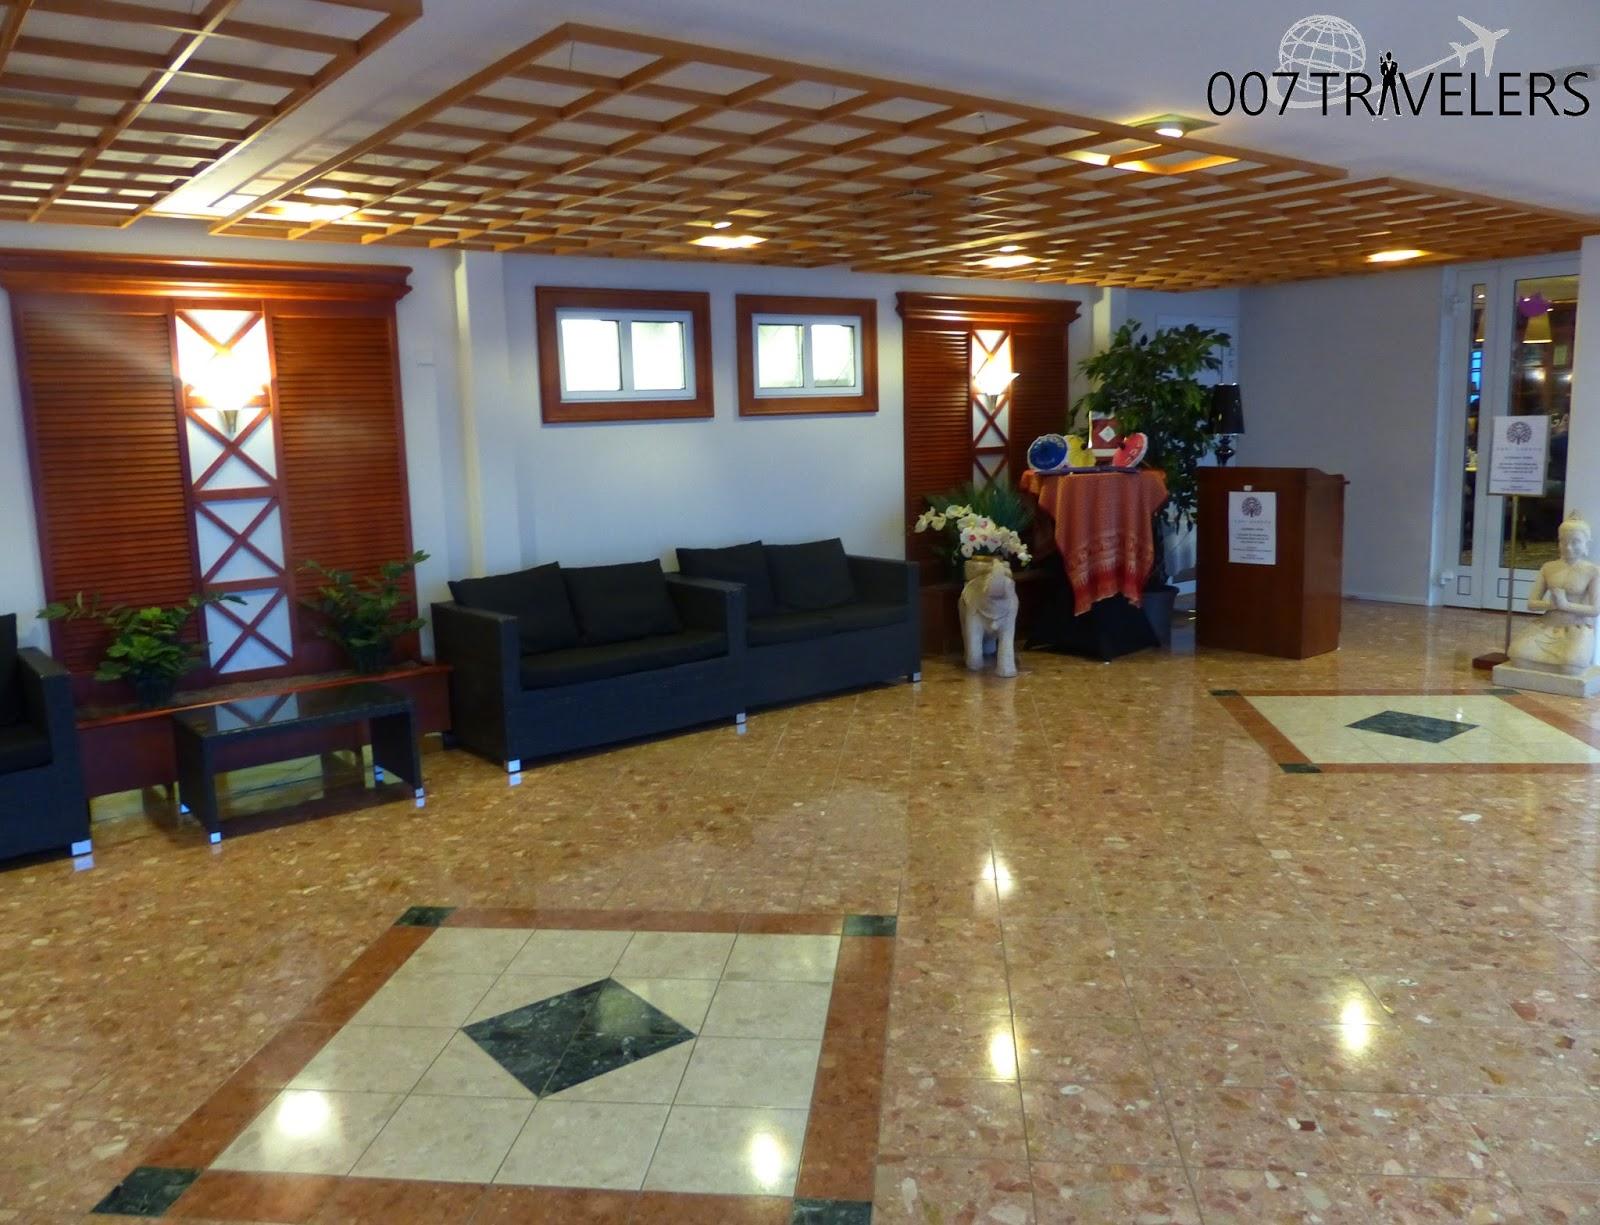 007 travelers 007 travelers report naantali spa goes